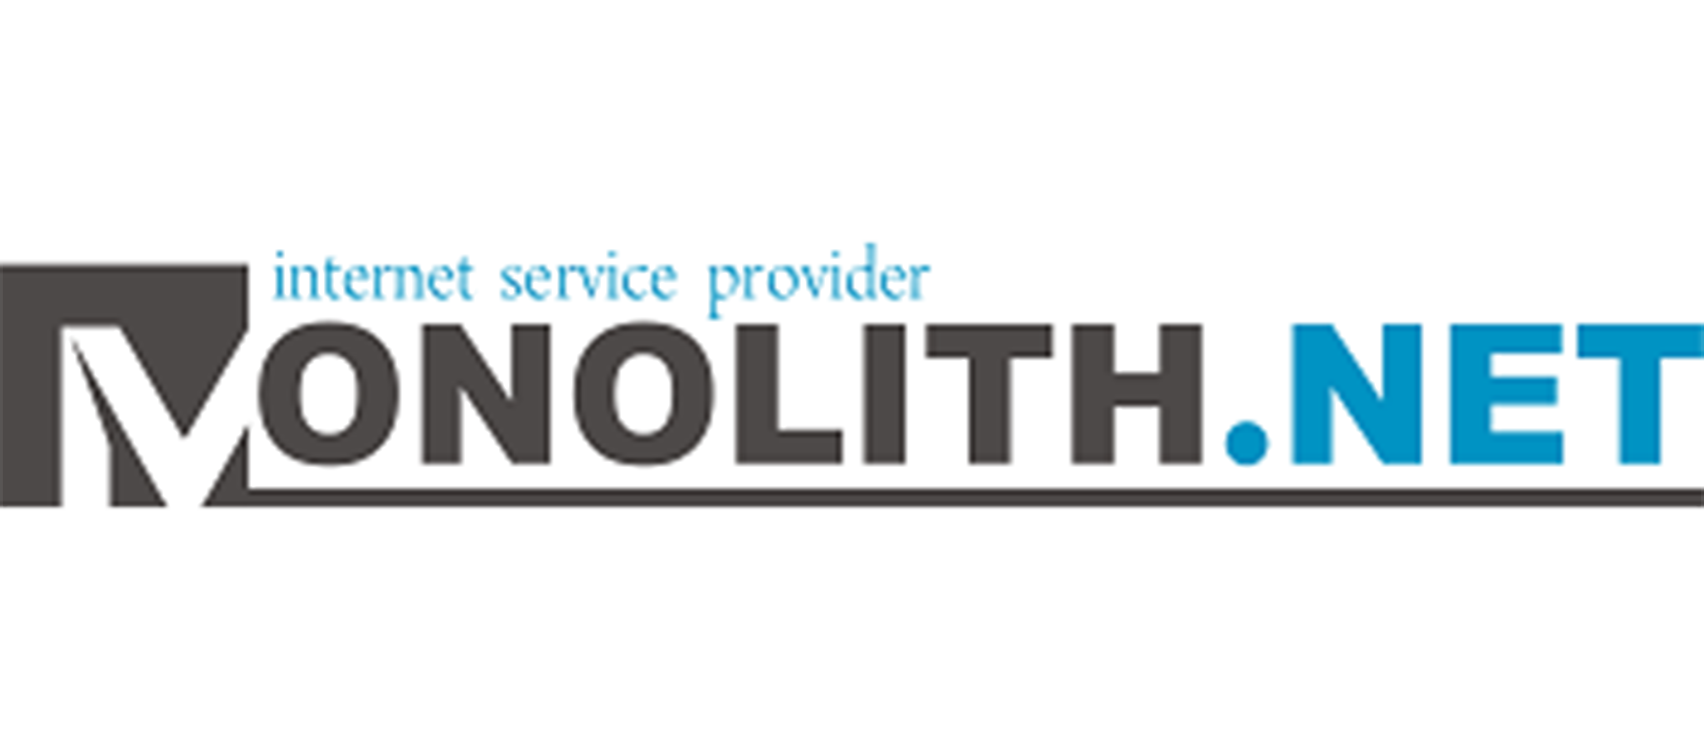 Monolit.net (Борисполь)